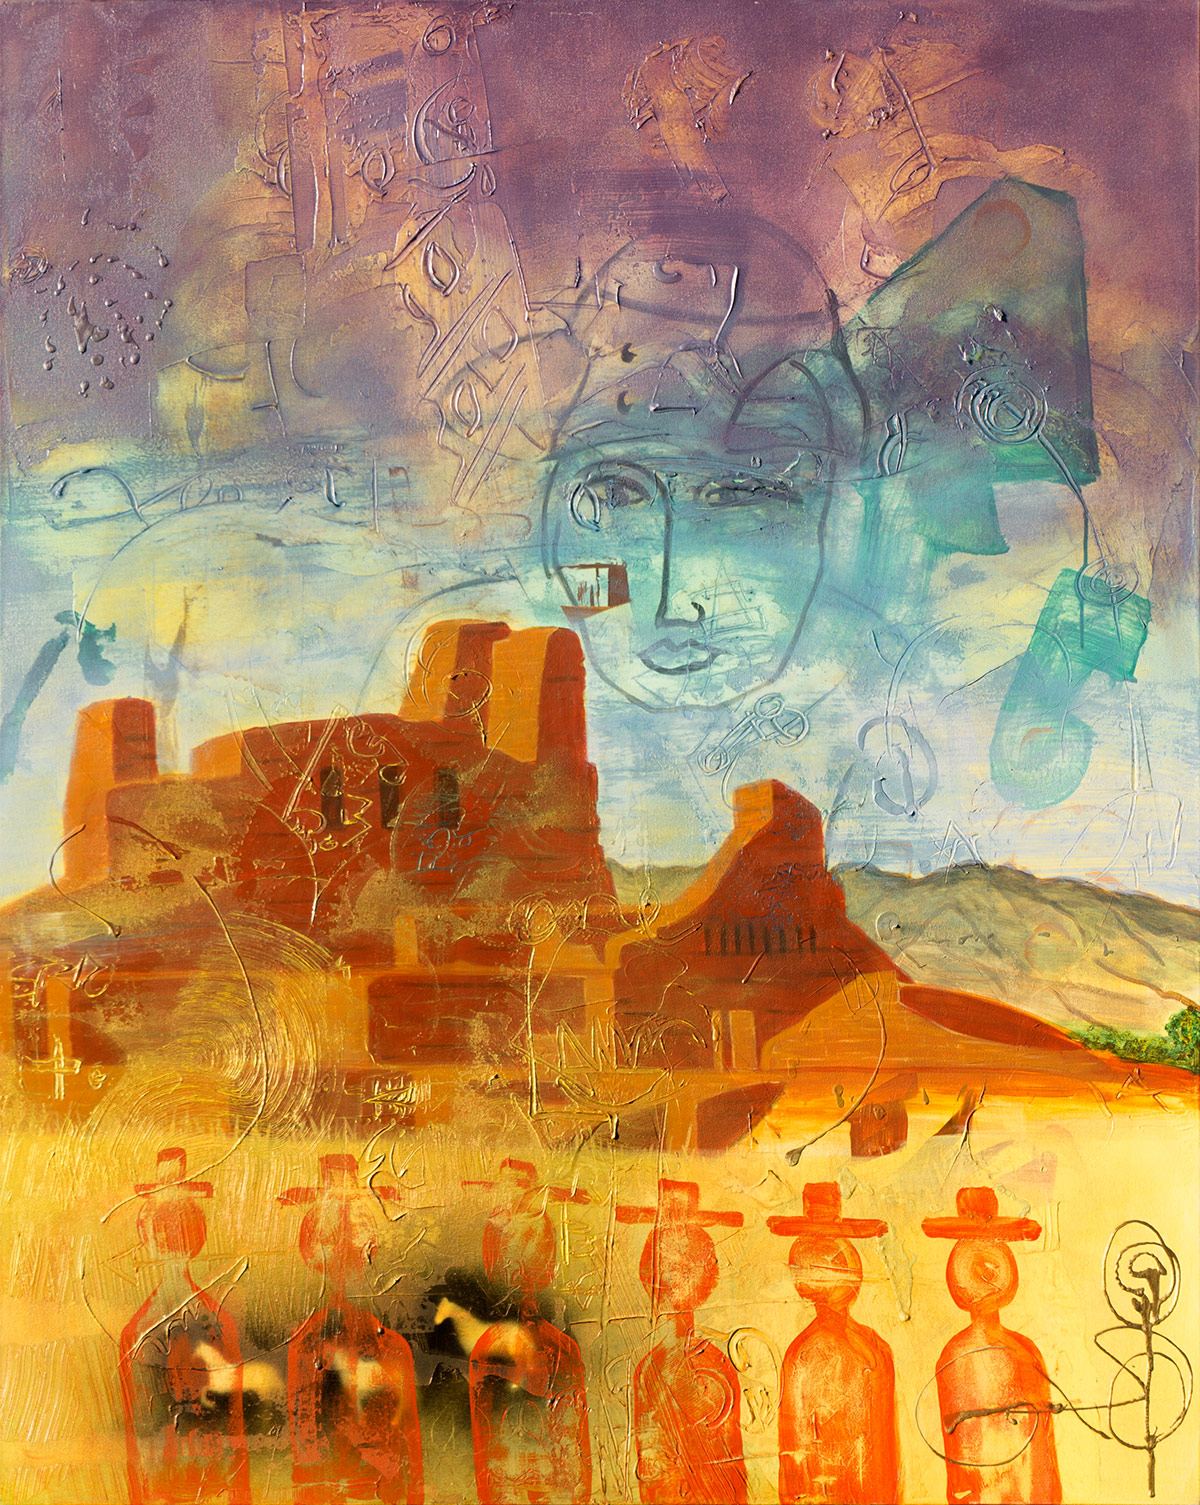 Abo, 2104, Acrylic on Canvas ©2014 Dan Badgley